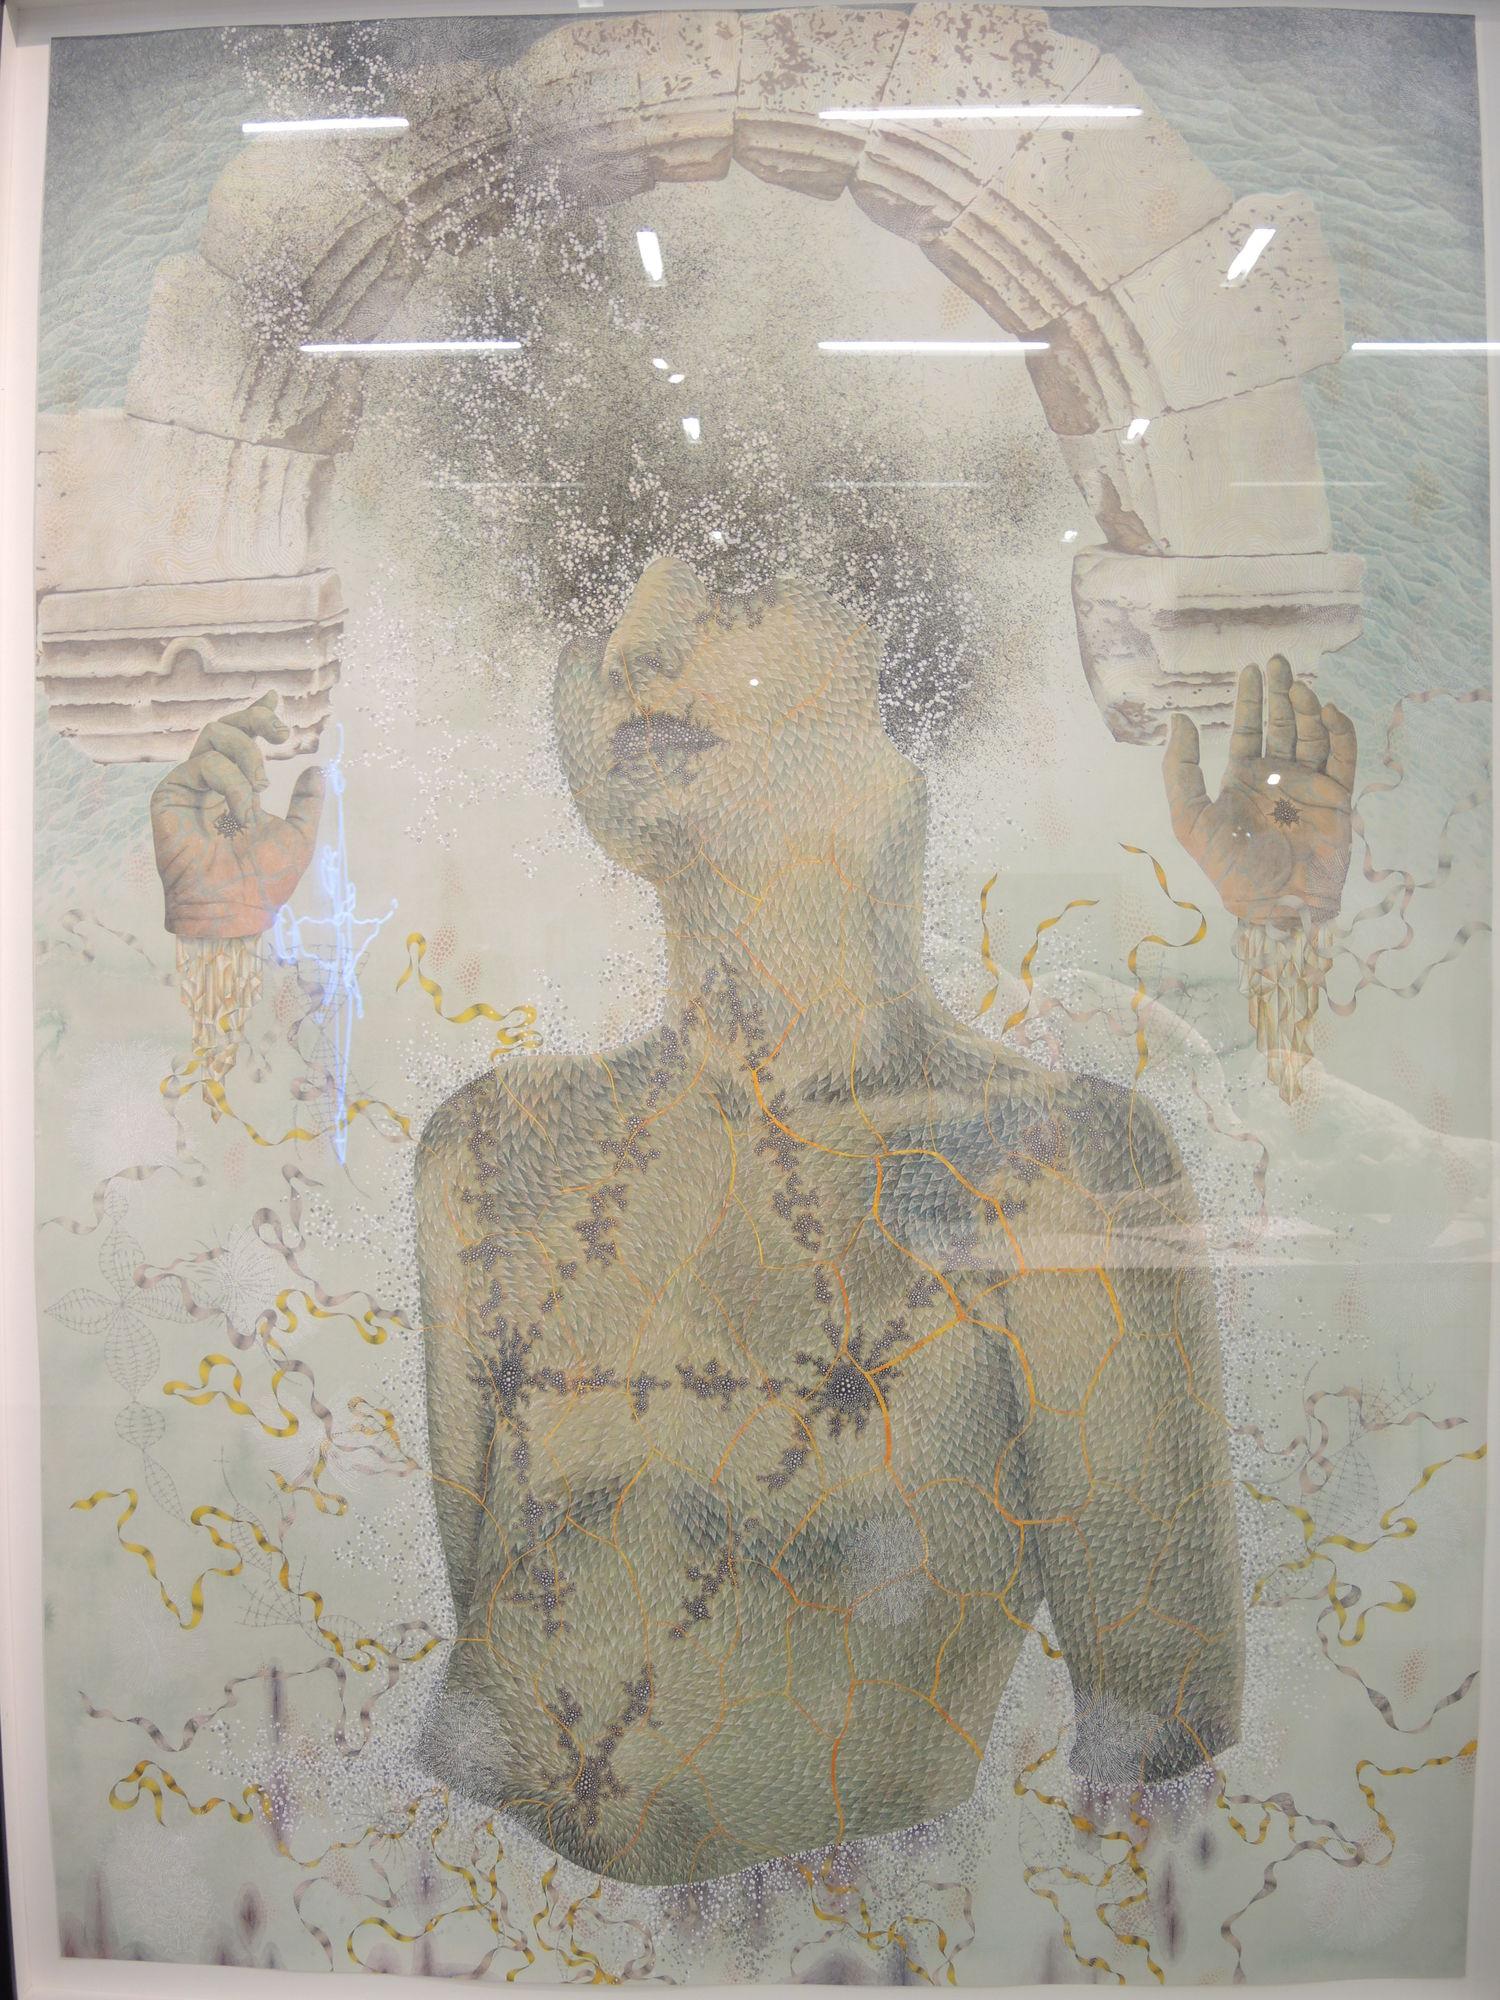 ART COLOGNE 2014 : Galerie Michael Haas